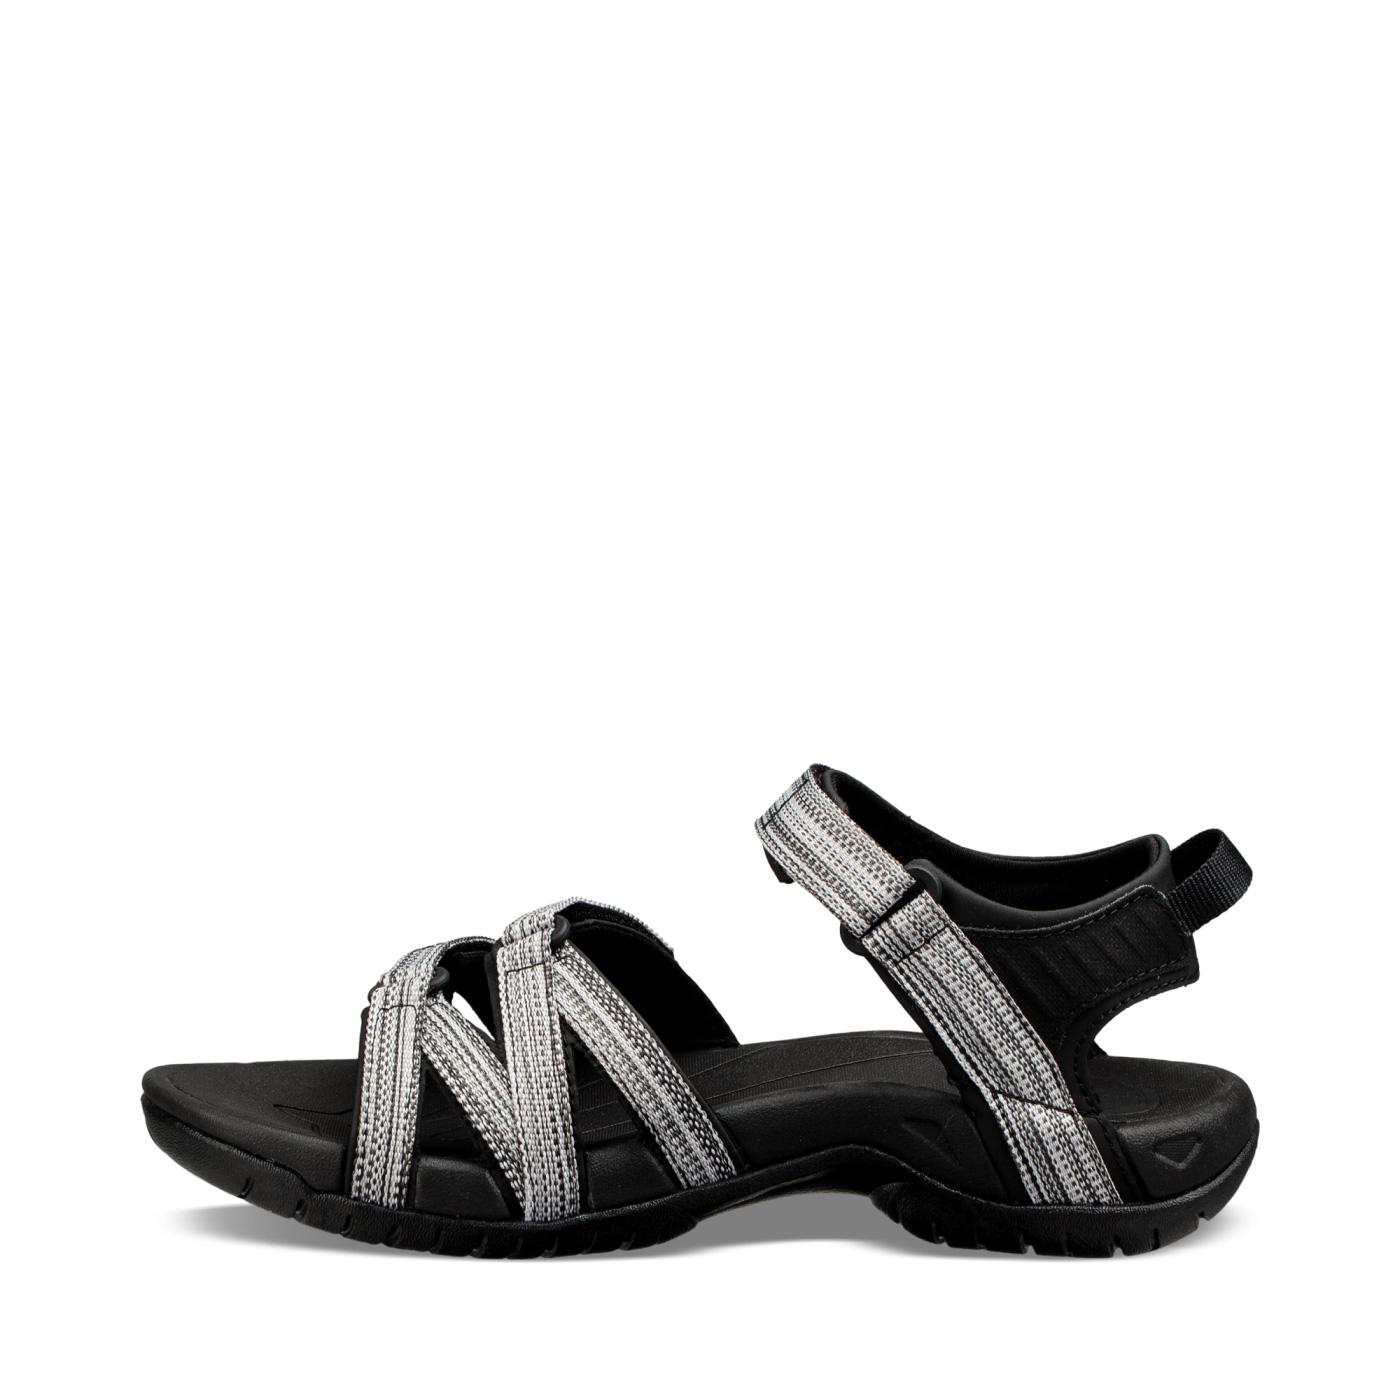 5300a9e07d65 Teva Tirra Sandals - Women s